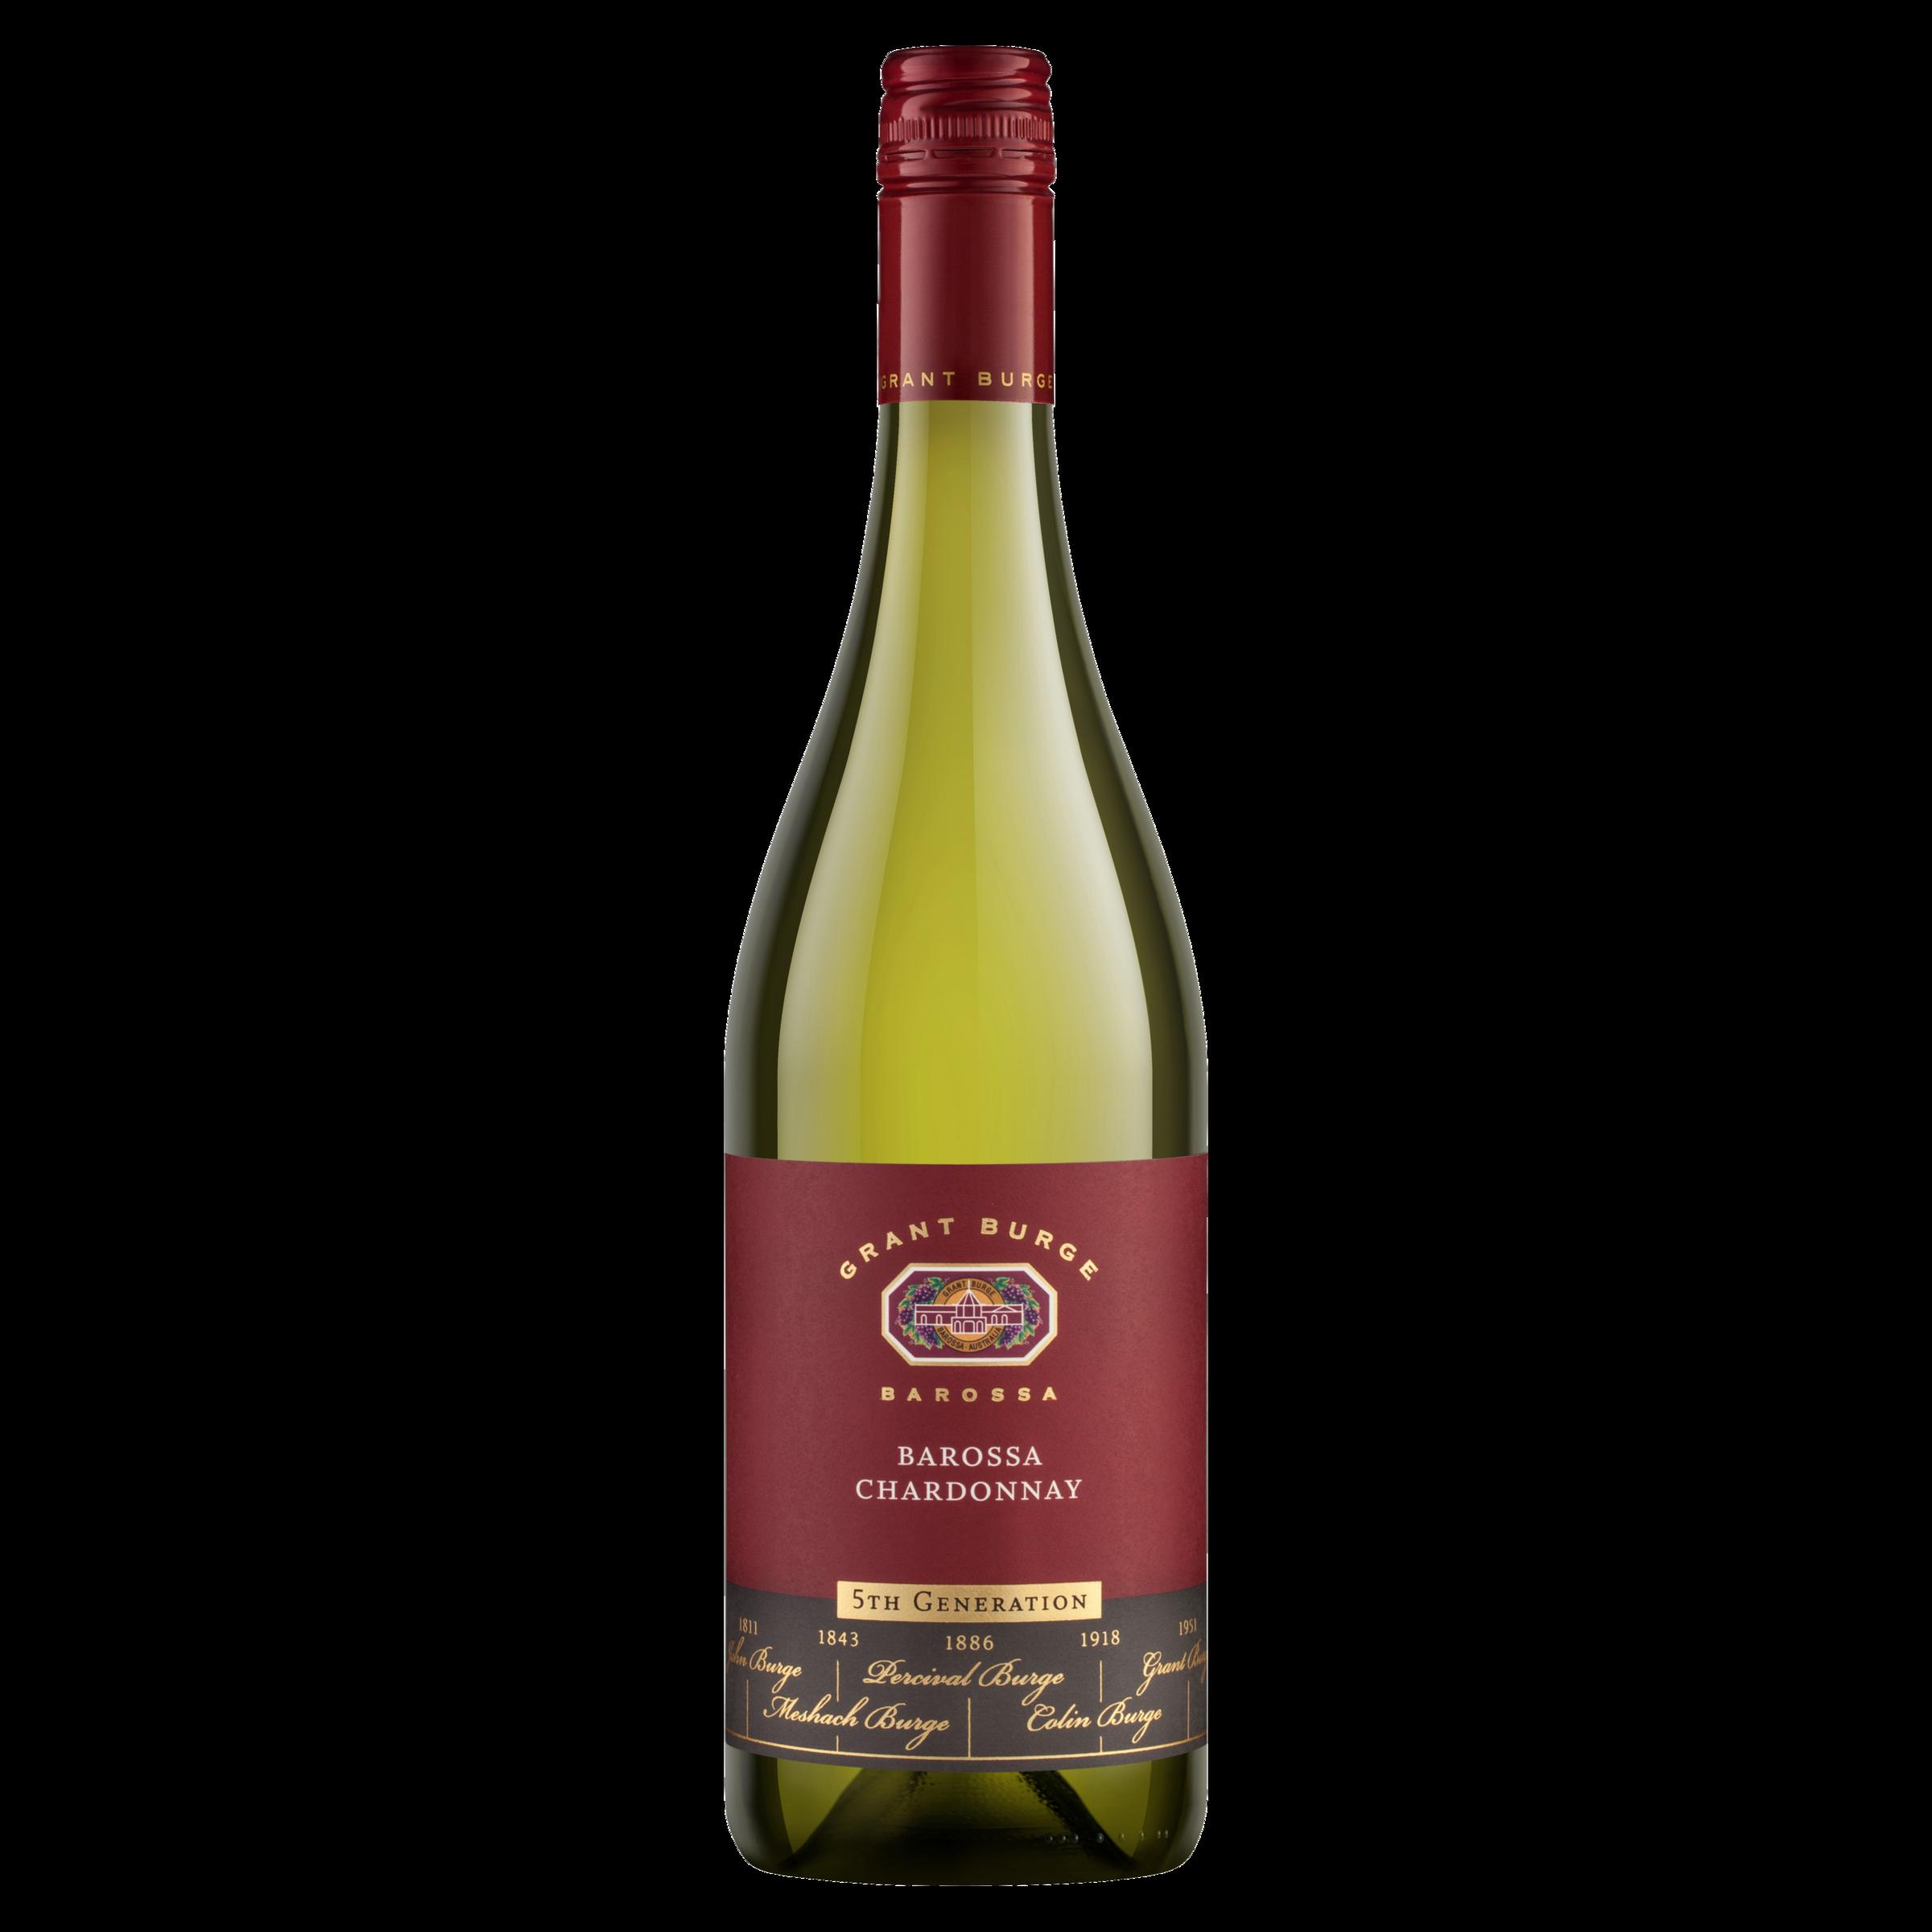 Grant Burge 5th Generation Chardonnay